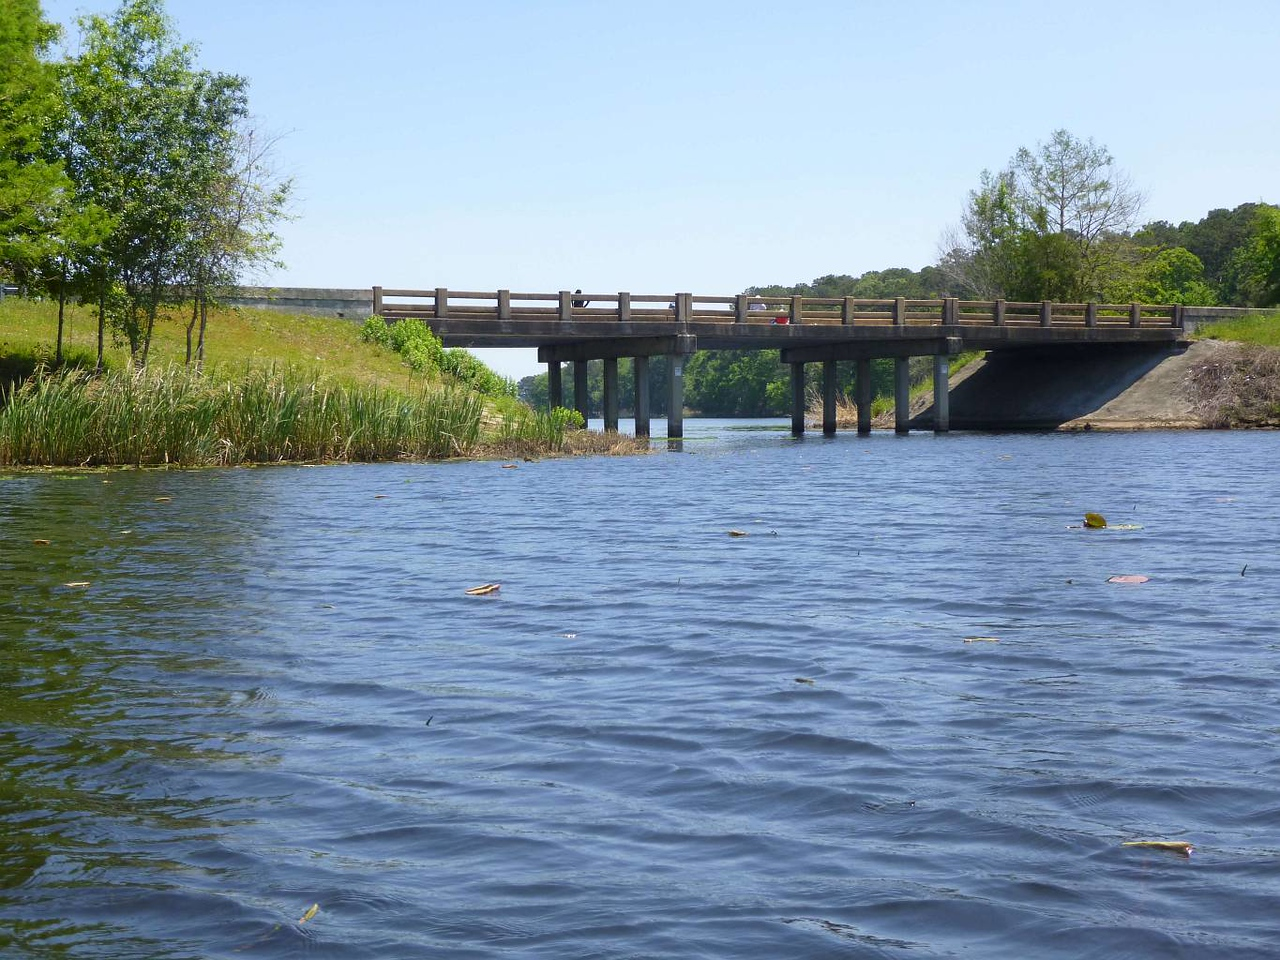 day 2 17 back under FL271 bridge P1020750-a-C